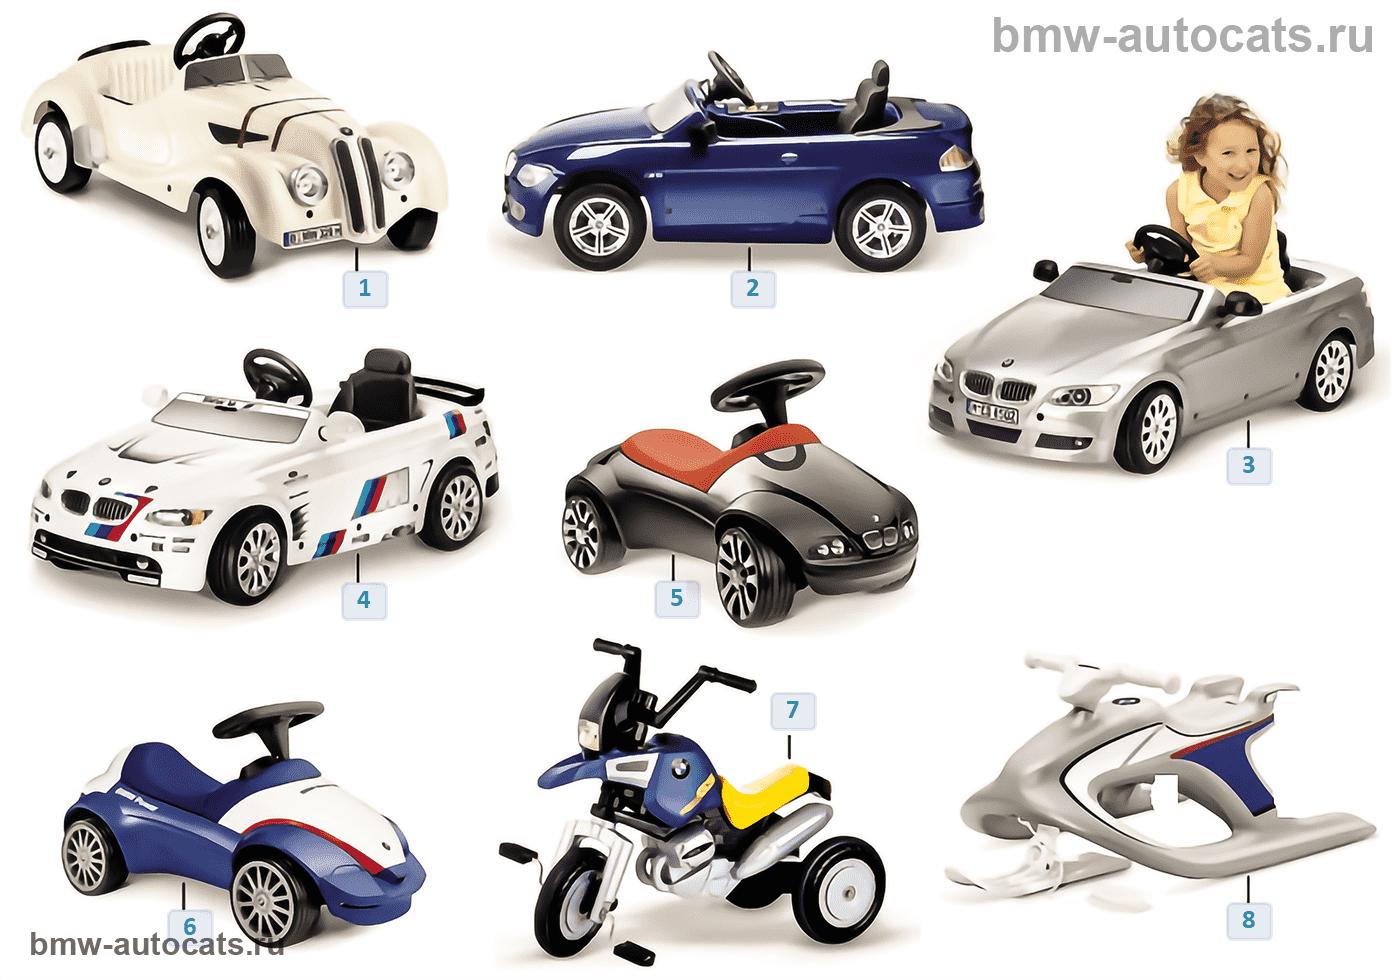 BMW Kinderprogramm — Fahrzeuge 2011/12